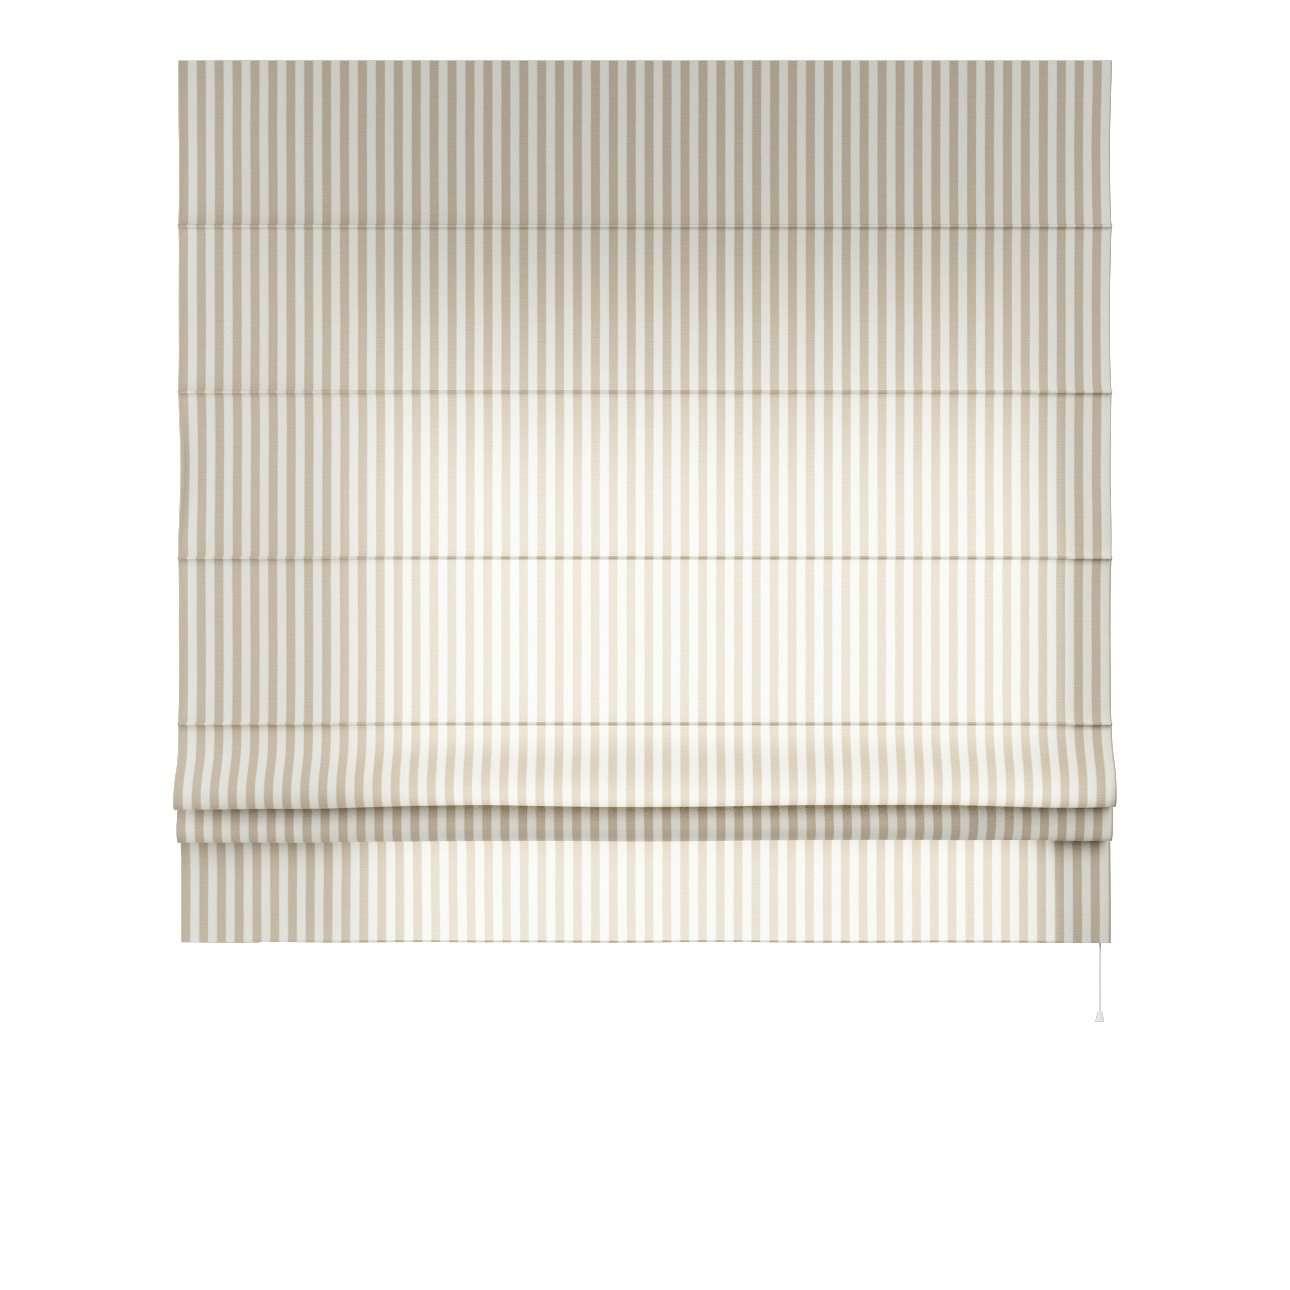 Romanetės Padva 80 x 170 cm (plotis x ilgis) kolekcijoje Quadro, audinys: 136-07